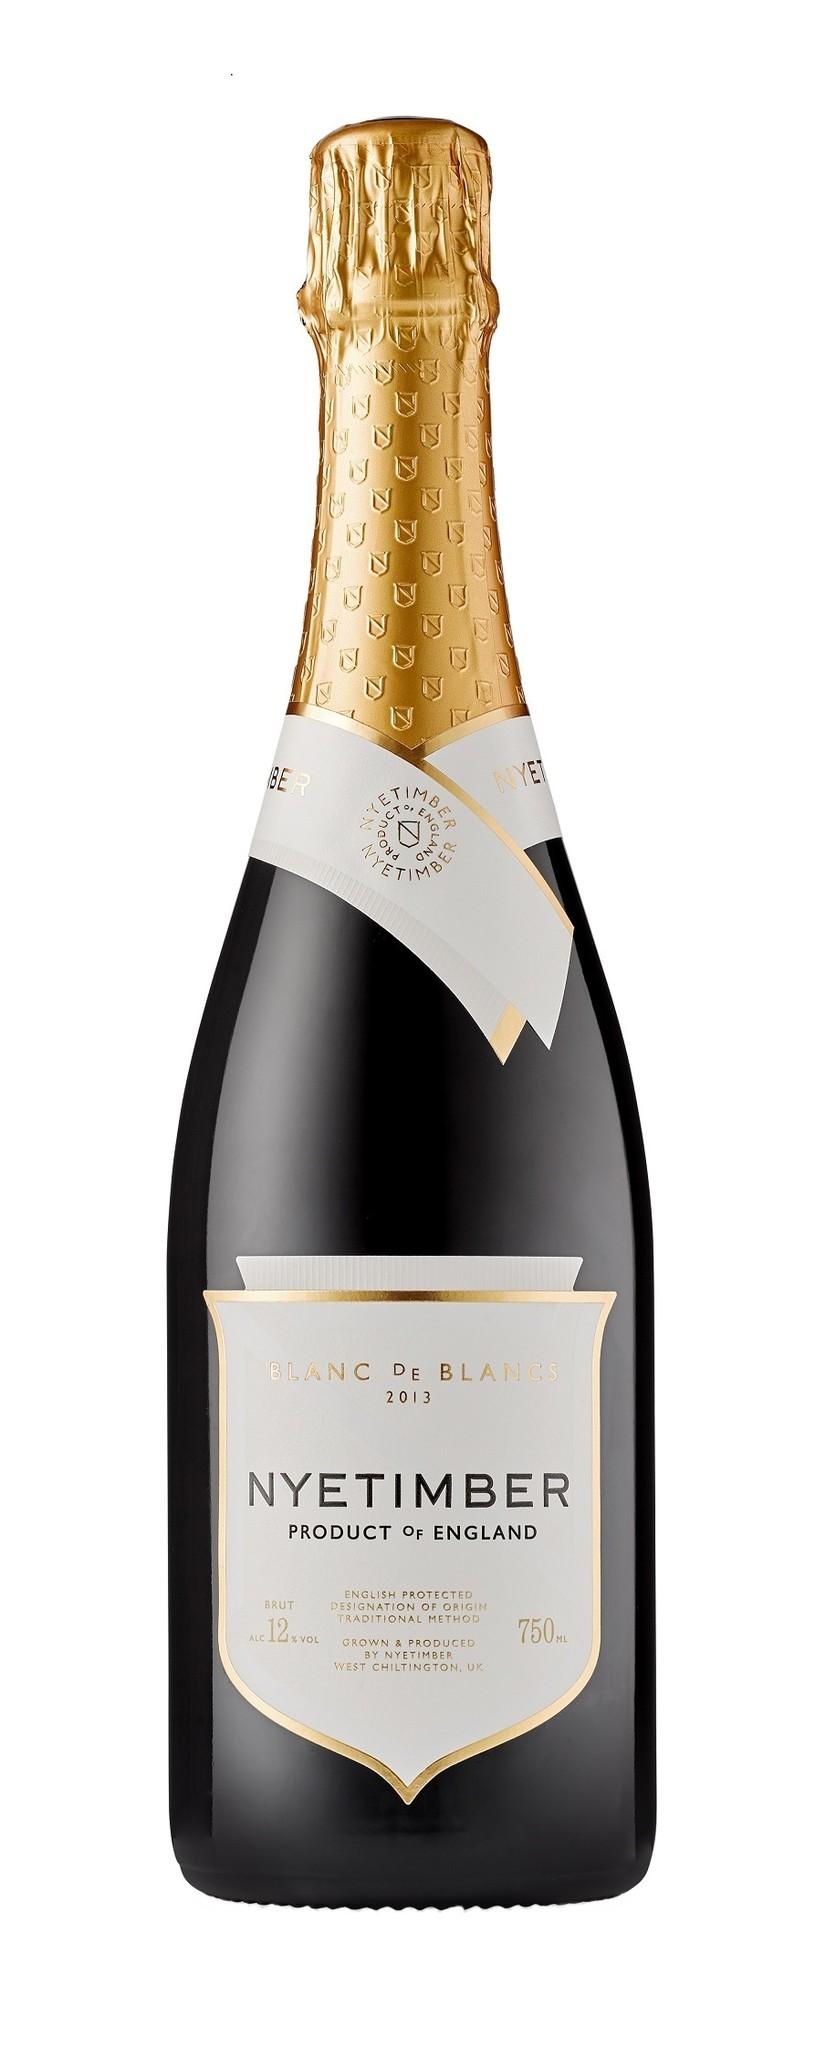 Nyetimber - West Sussex 2013 Blanc de Blancs sparkling wine England, Nyetimber